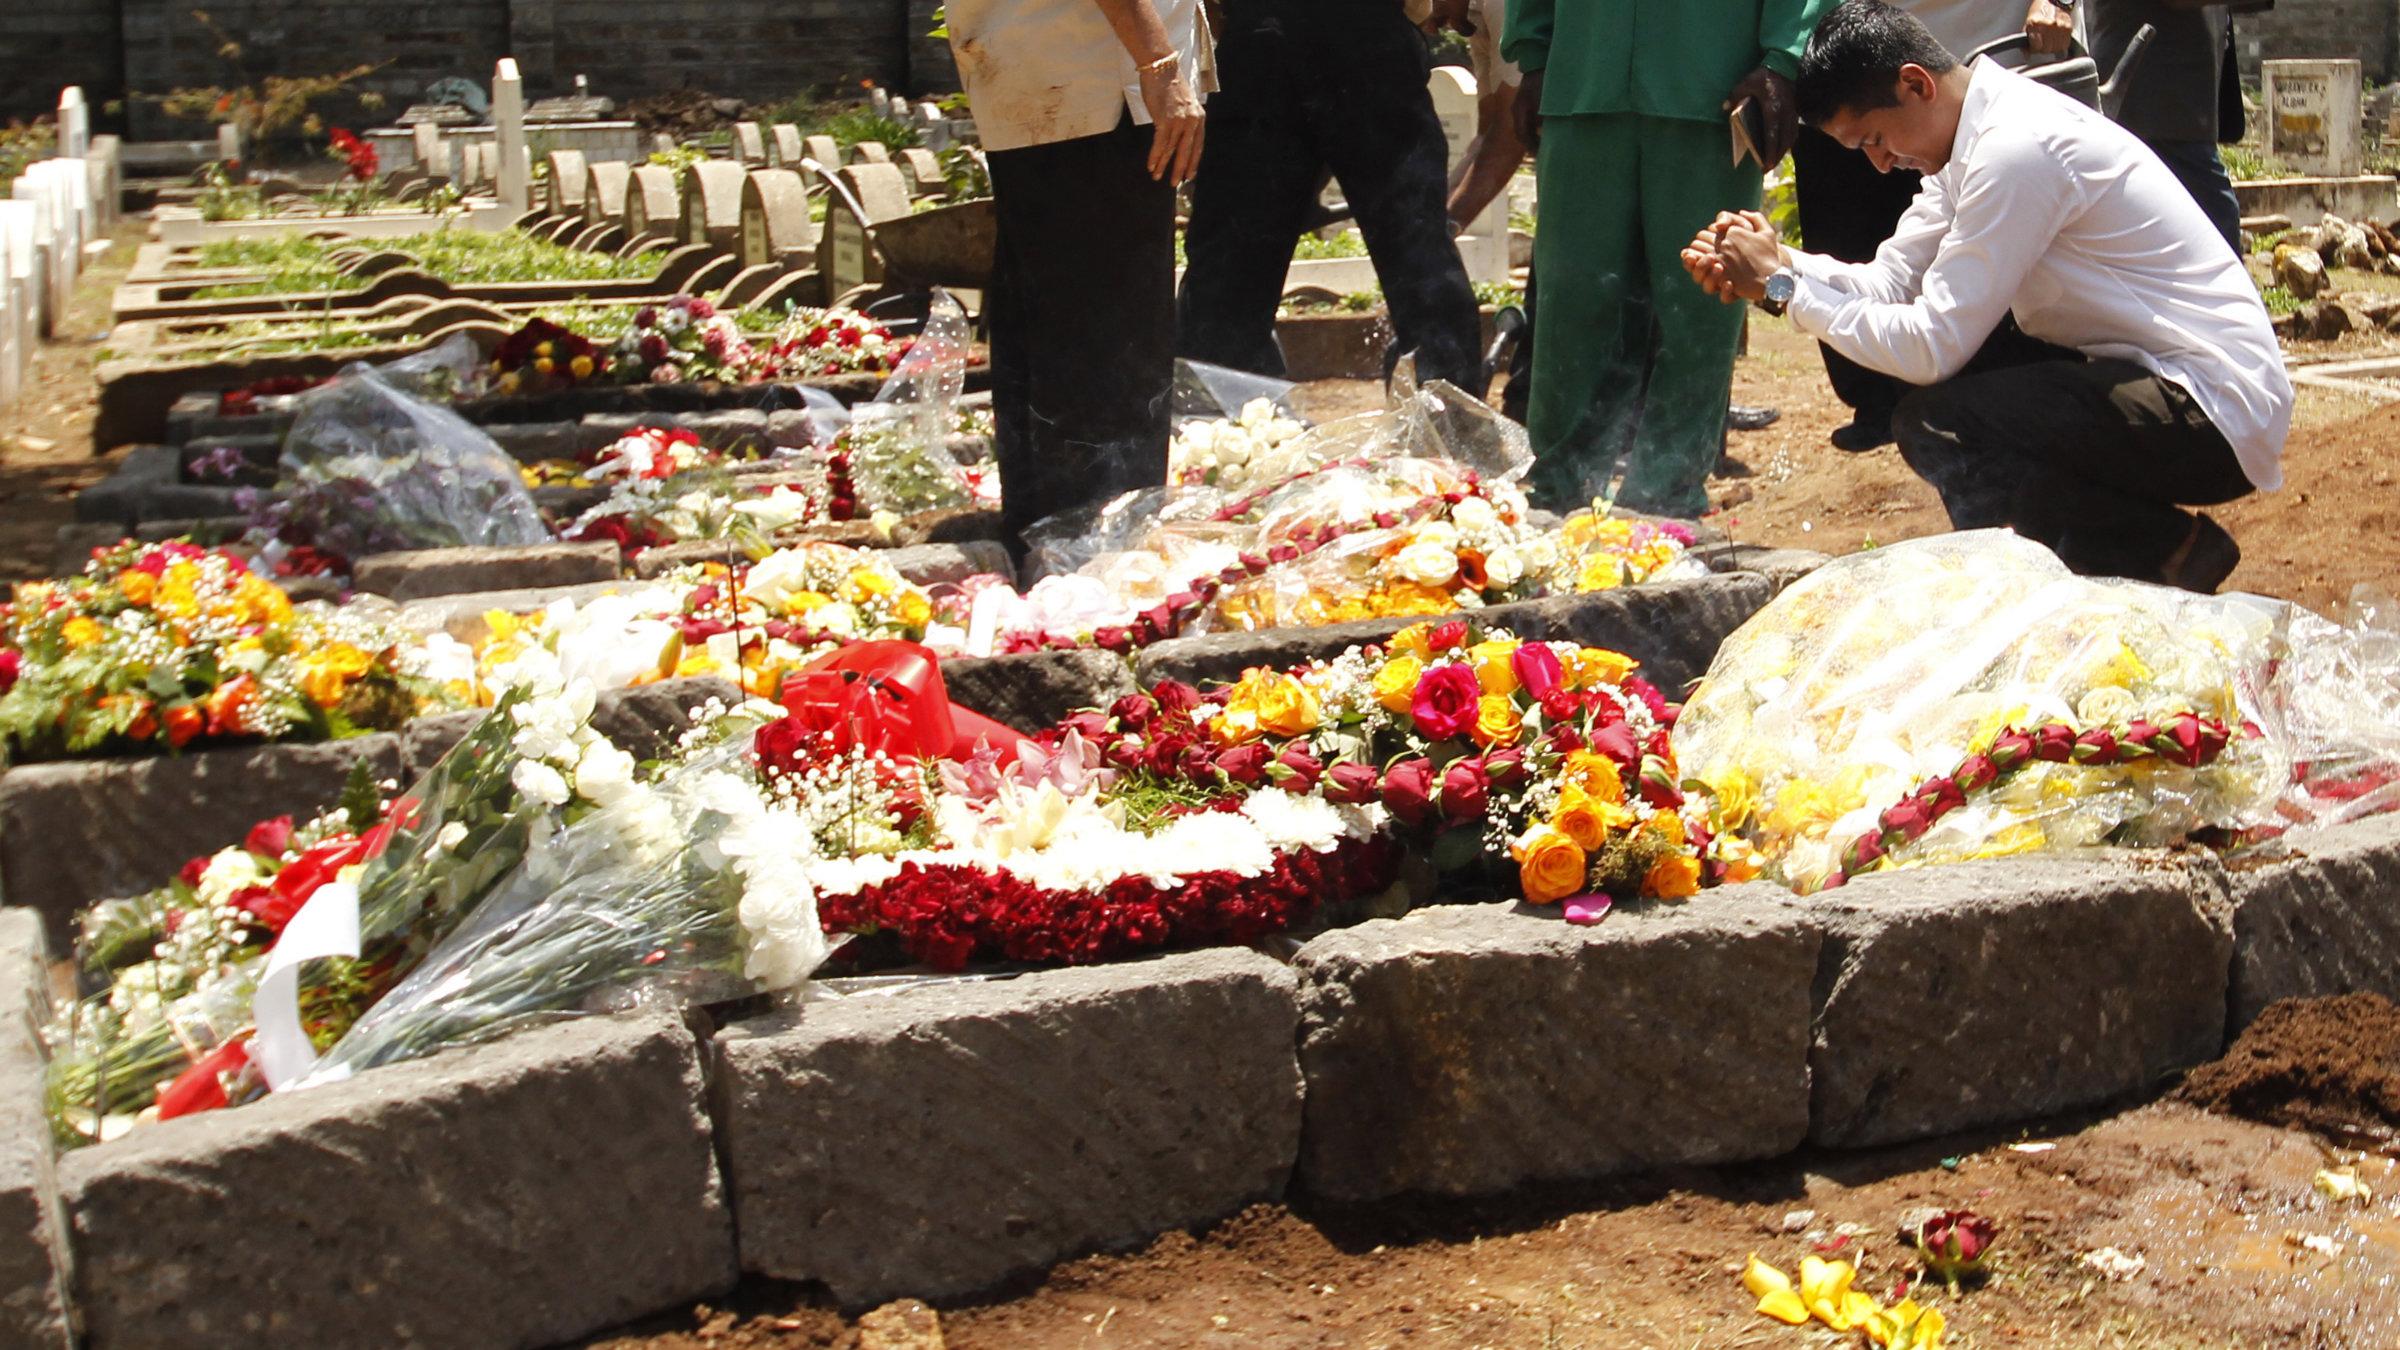 For kenyas ismaili muslims eight funerals for those killed in the for kenyas ismaili muslims eight funerals for those killed in the name of islam quartz izmirmasajfo